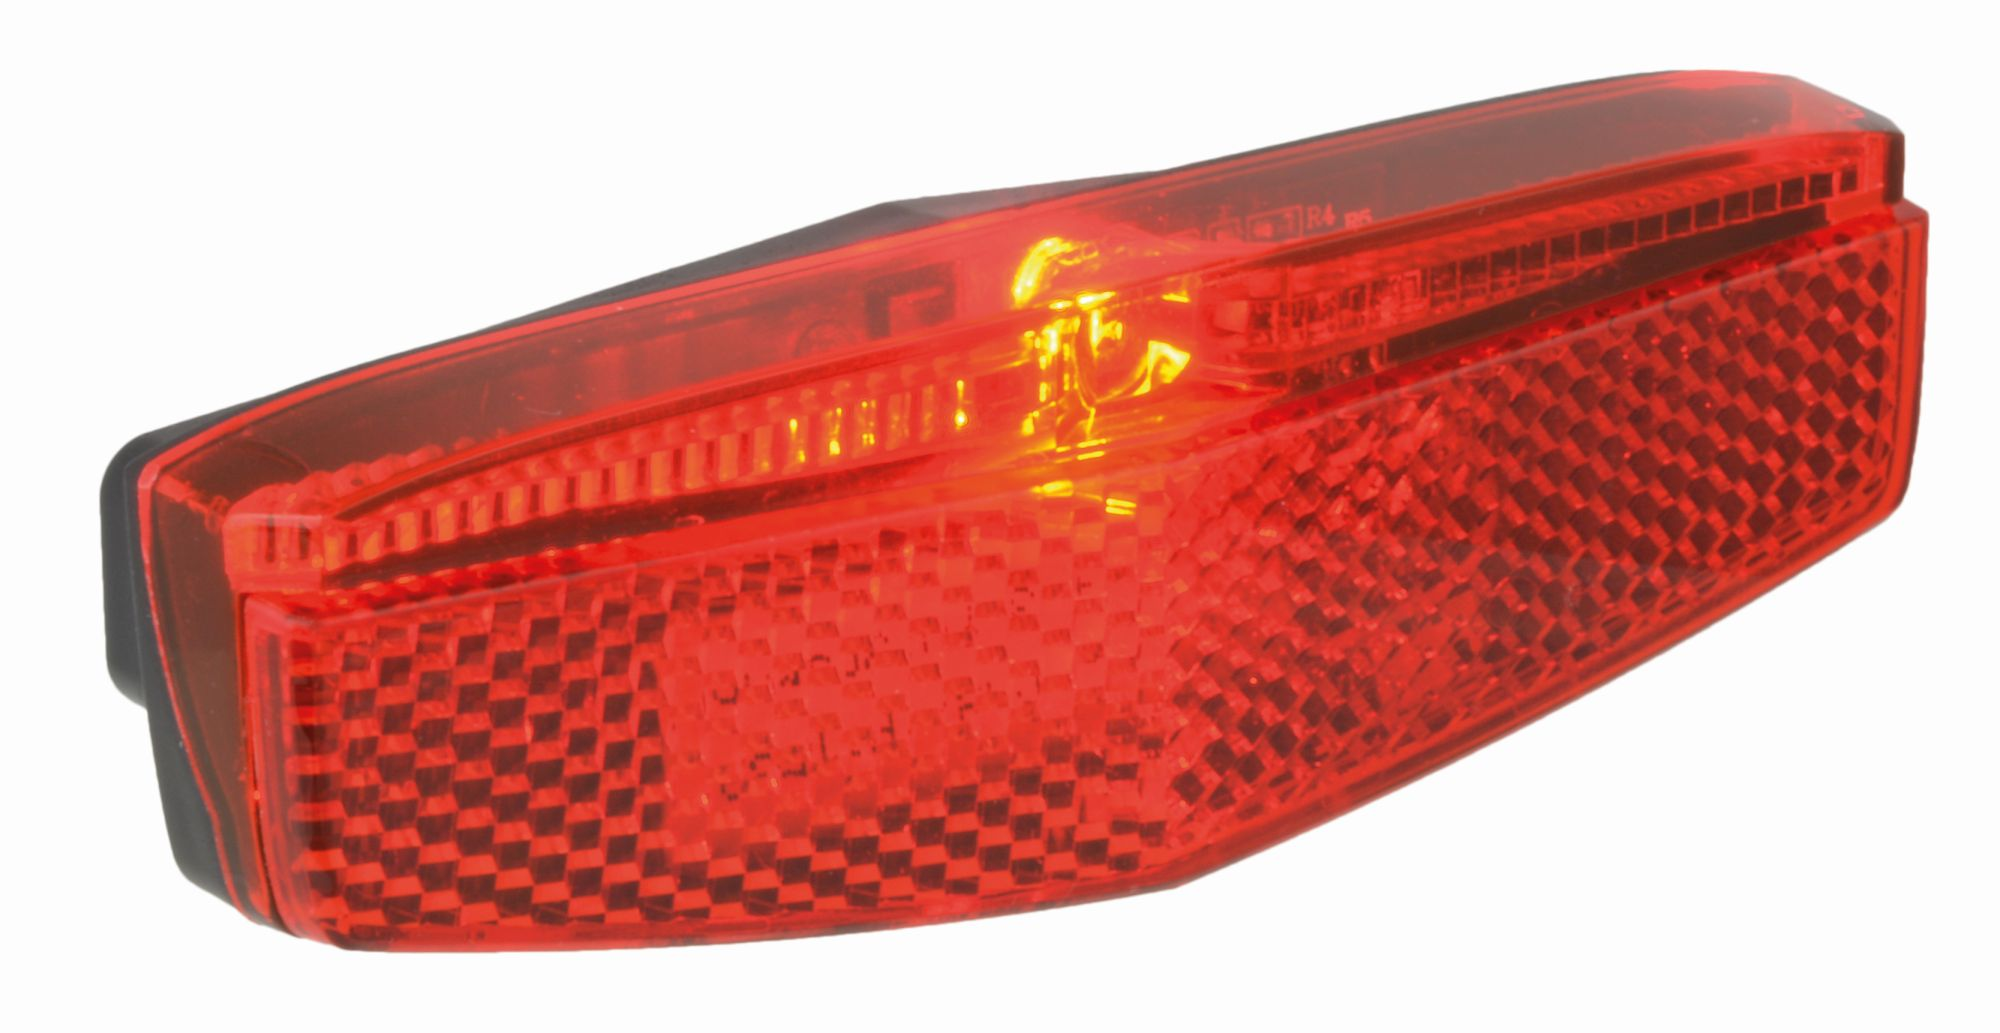 Fuxon LED-Rücklicht R100 Akku